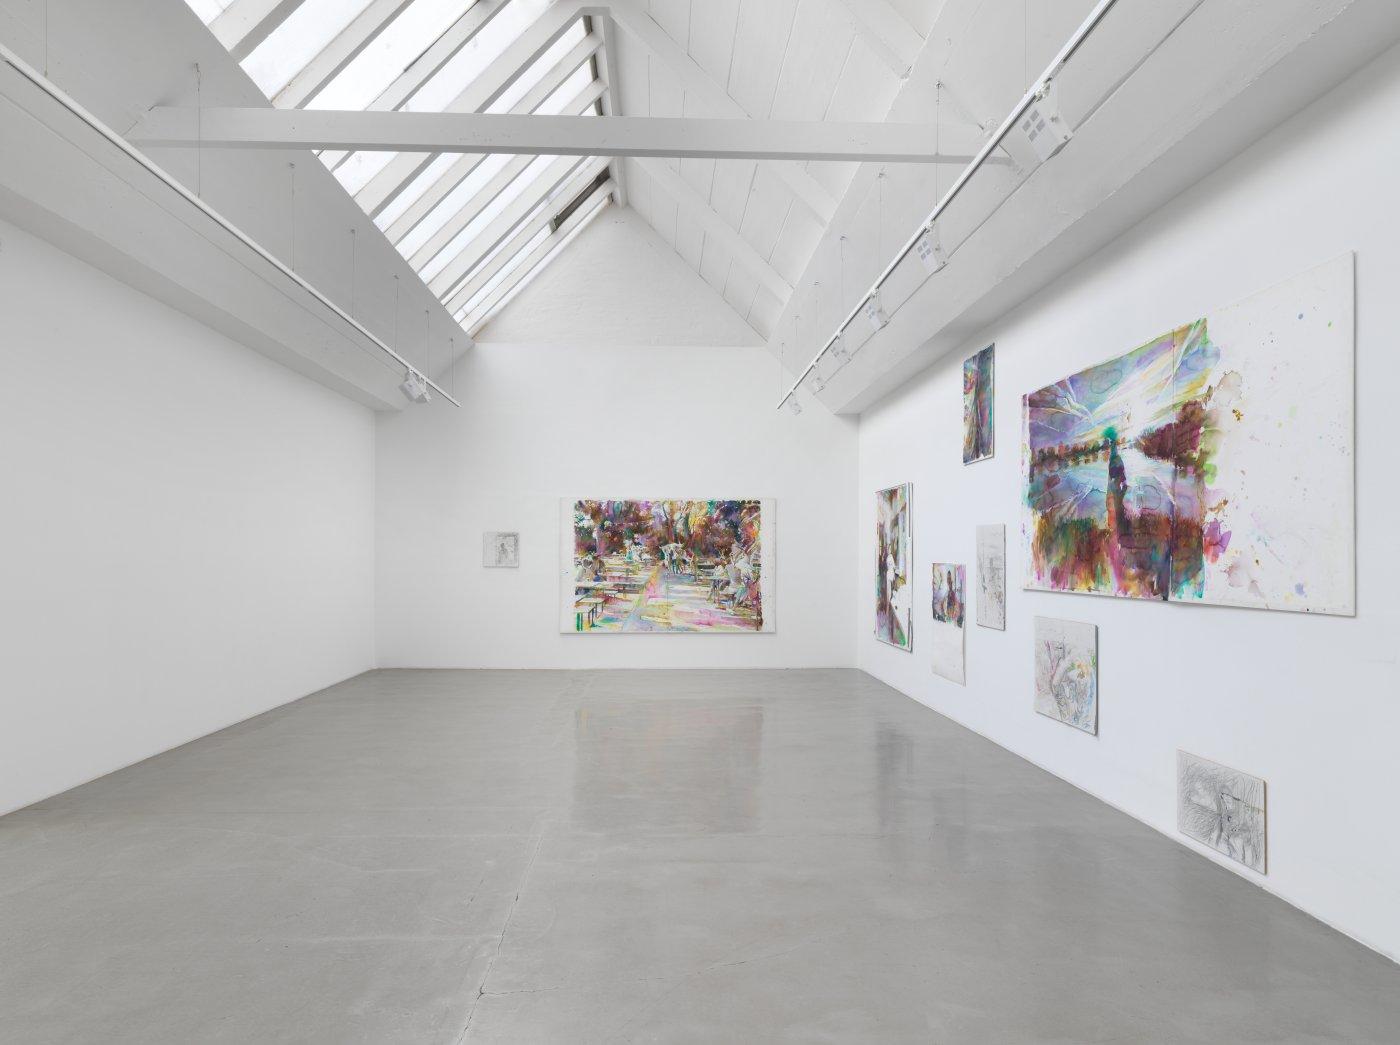 Galerie Barbara Thumm Martin Dammann 7